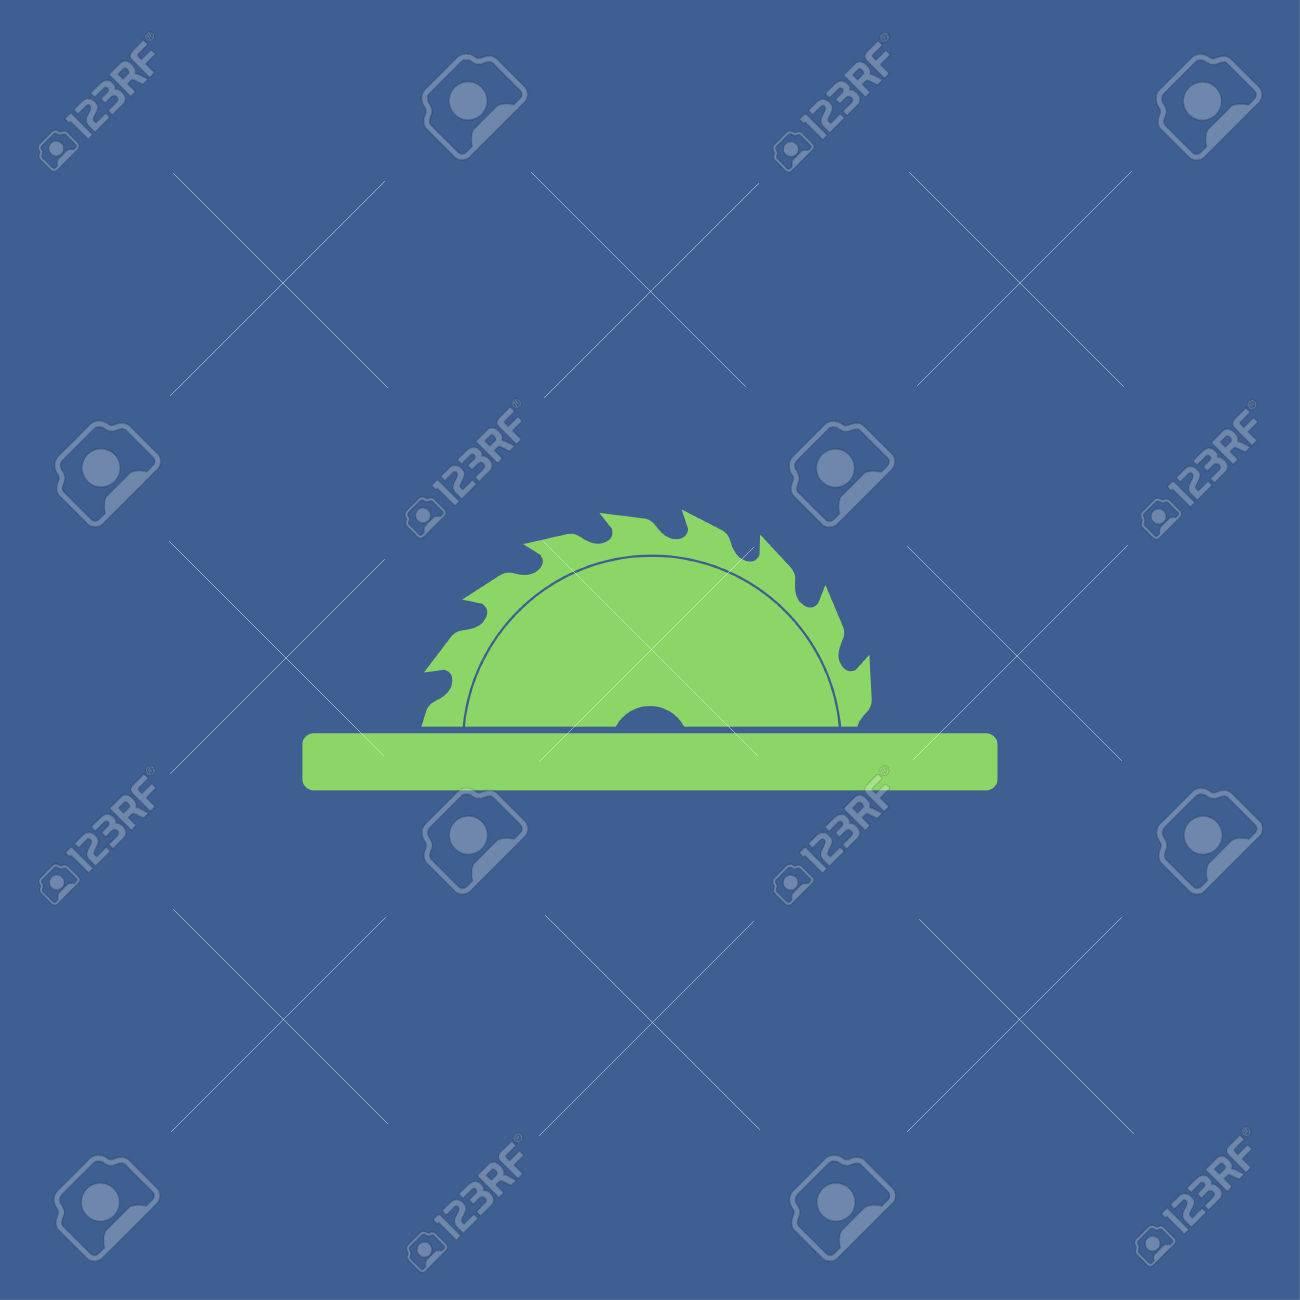 Circular saw blade. Concept illustration for design. - 57894774